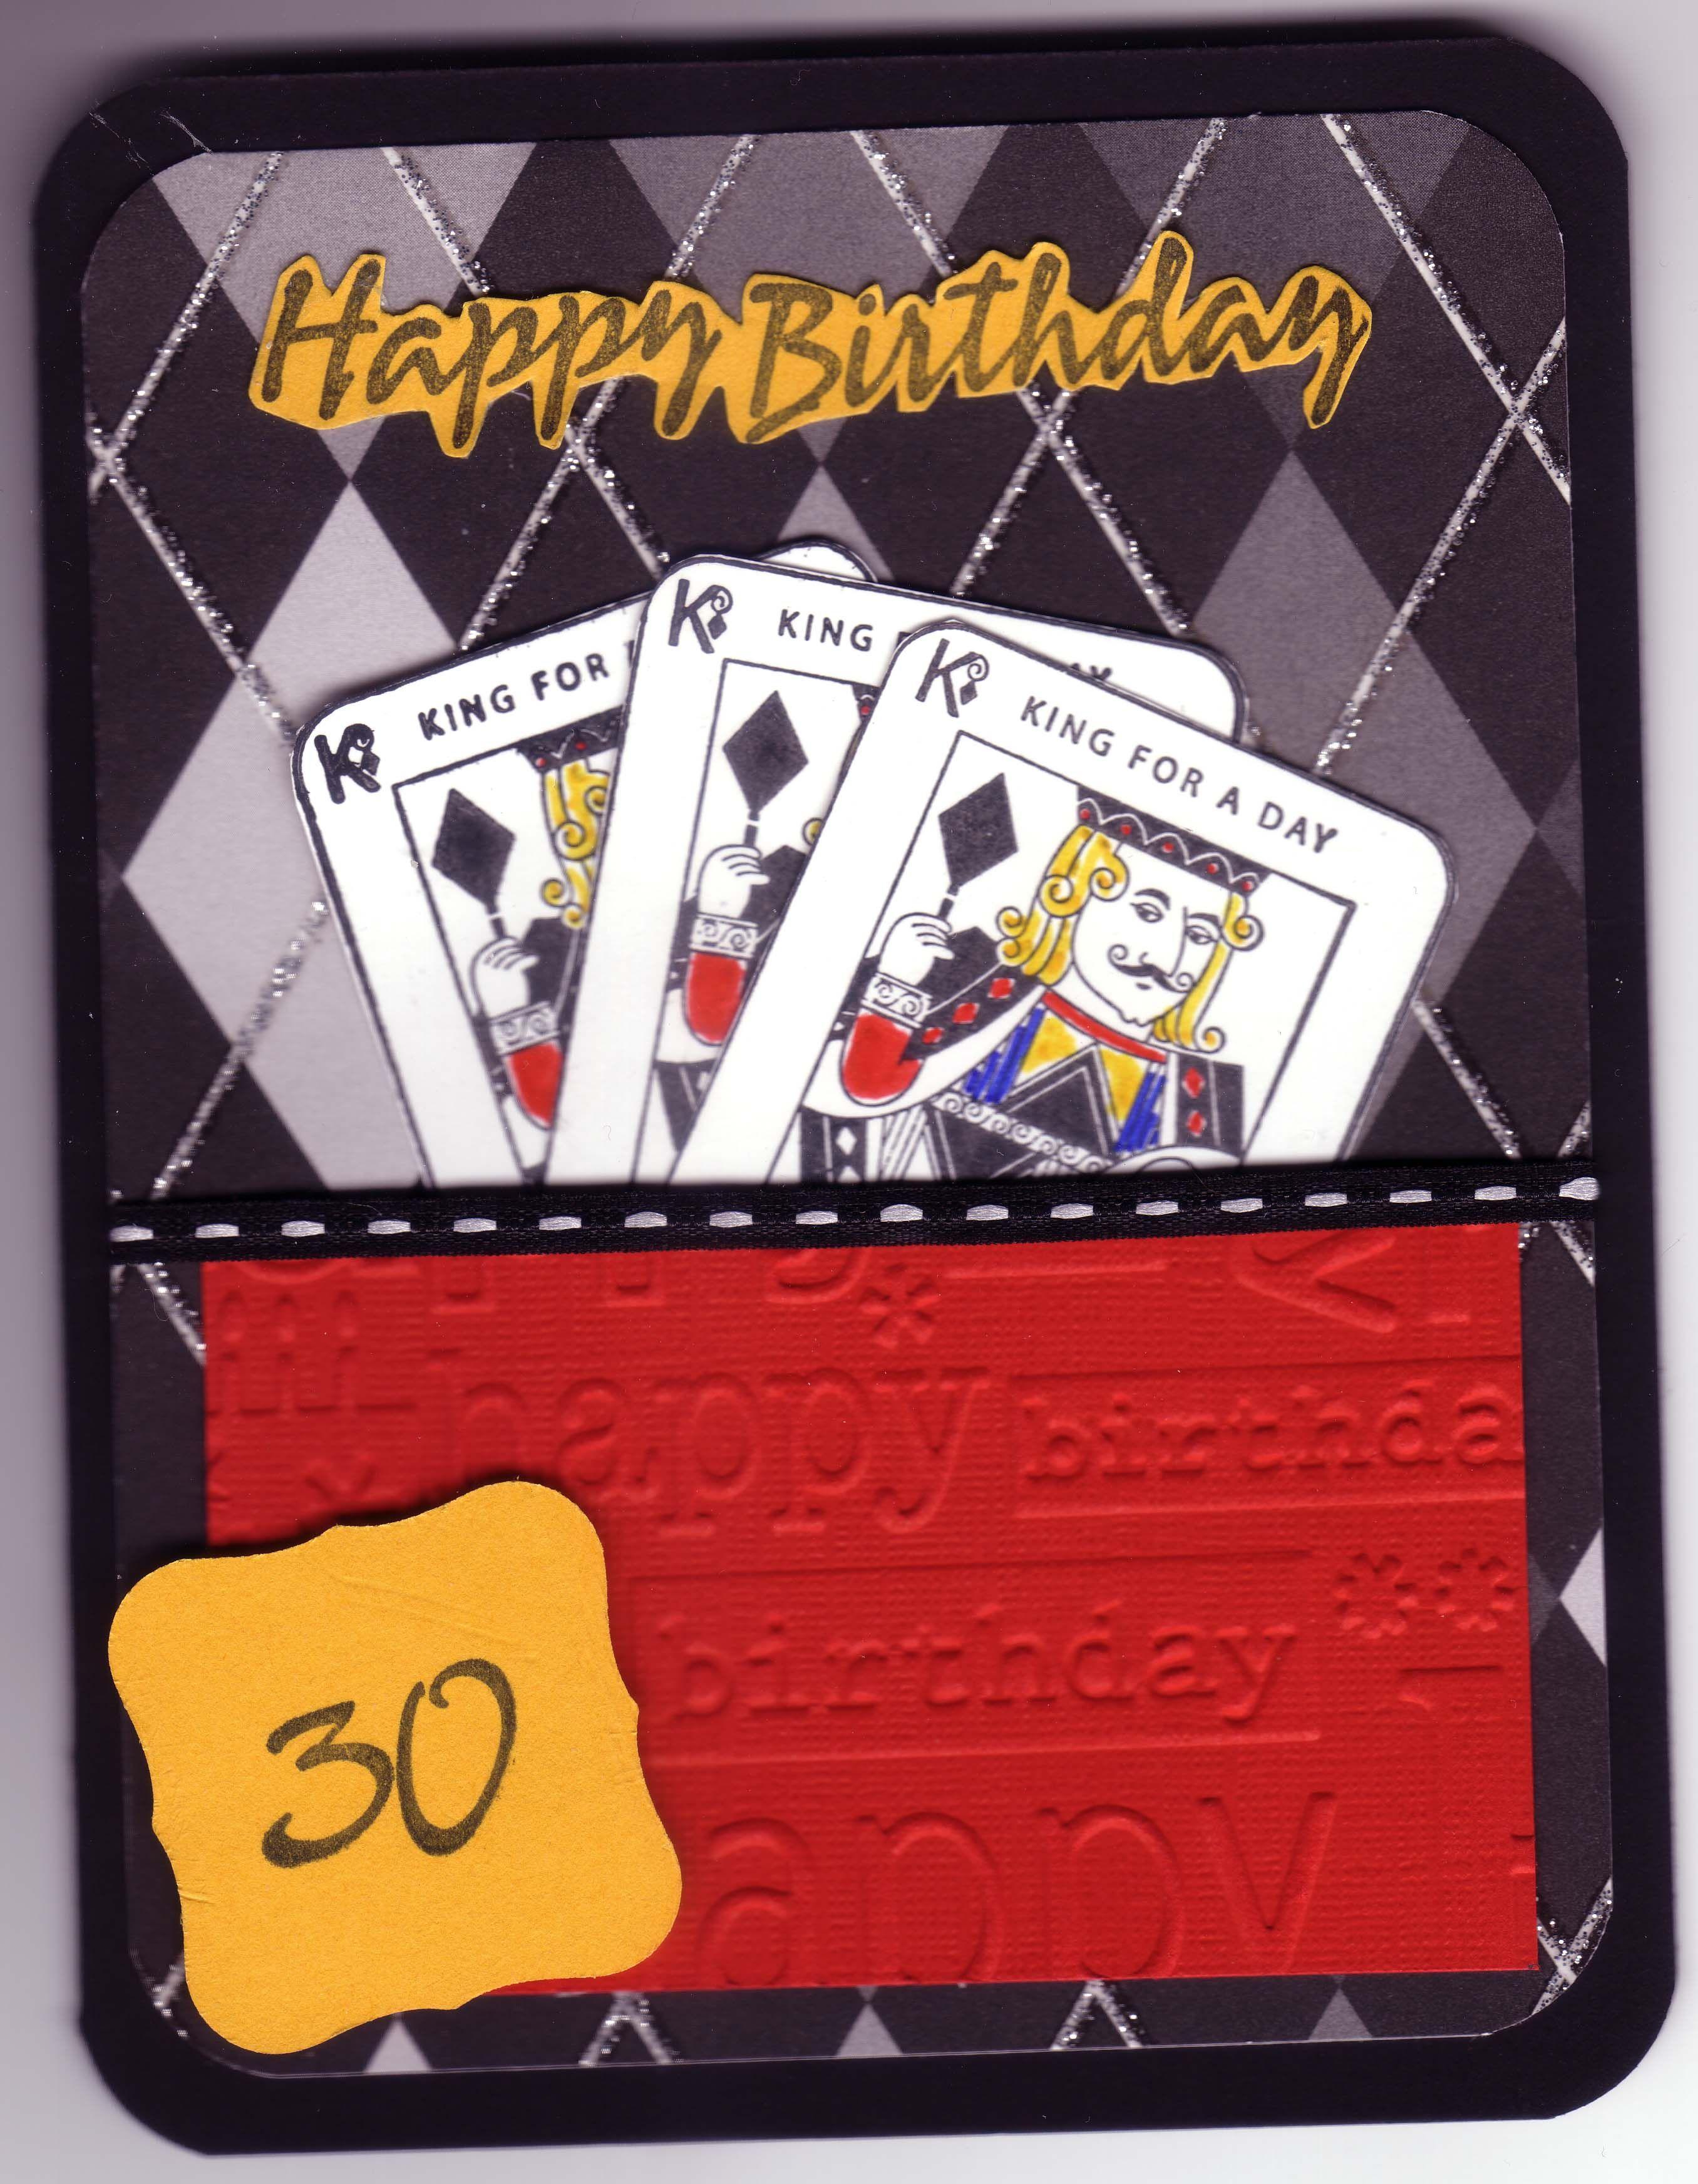 30th birthday card 2 30th birthday cards birthday cards